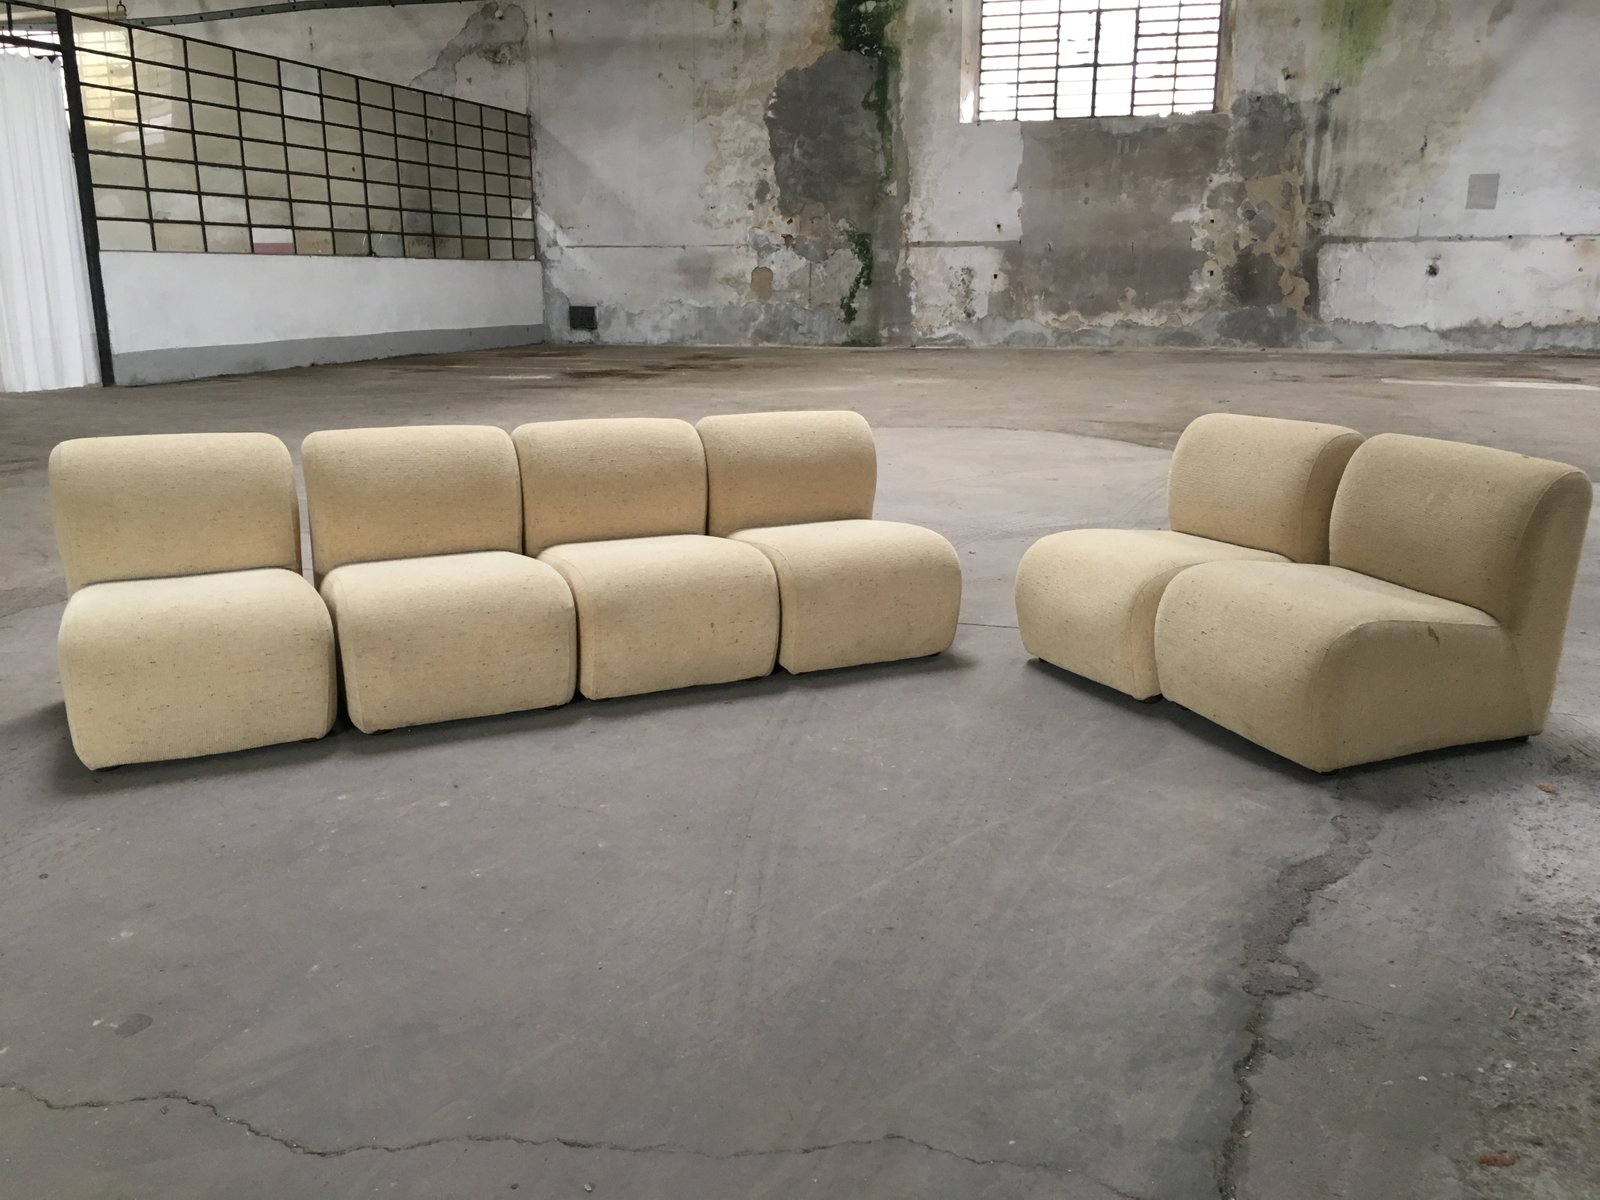 Italian Modular Sofa, 1970s for sale at Pamono